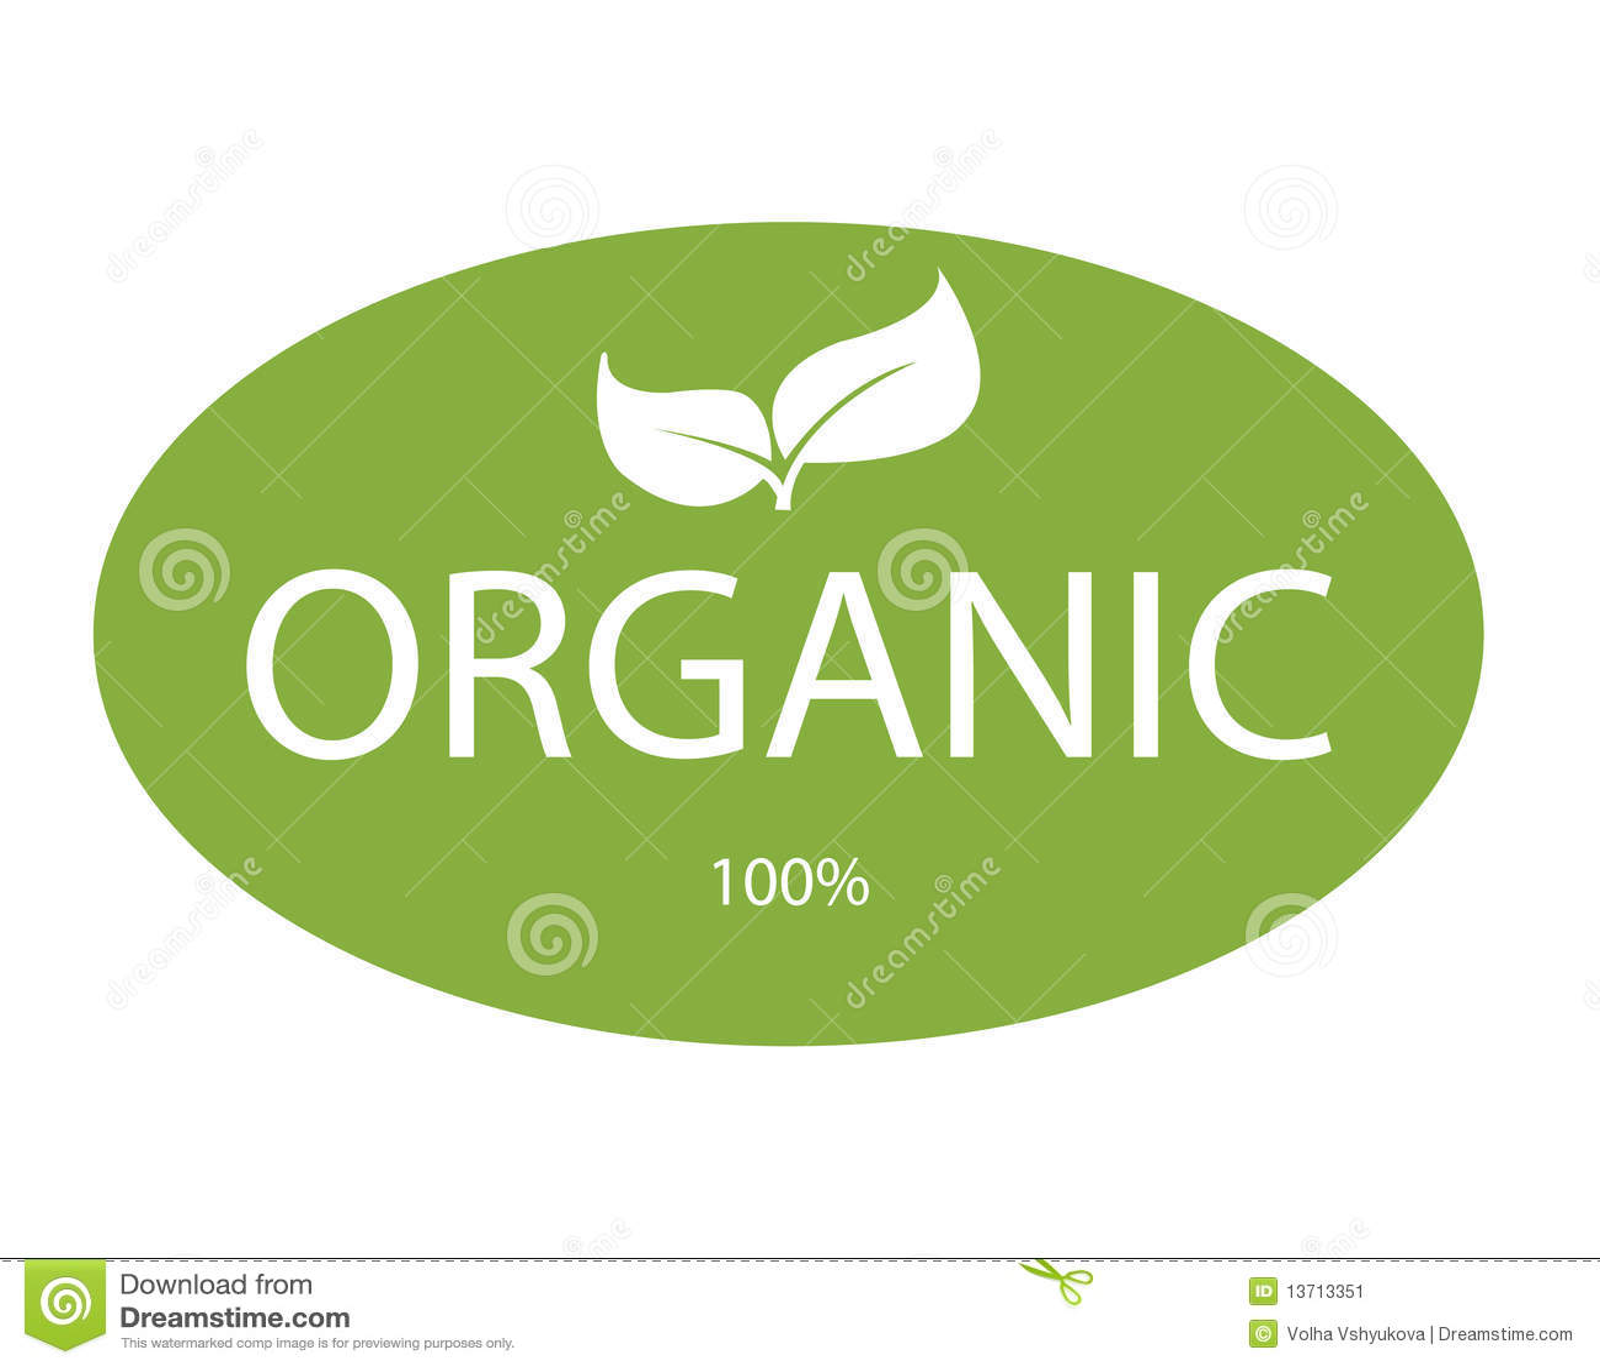 Organic Green Bio Lab Logo Vector Icon:  Organic Lable Stock Vector . Illustration Of Lifestyle